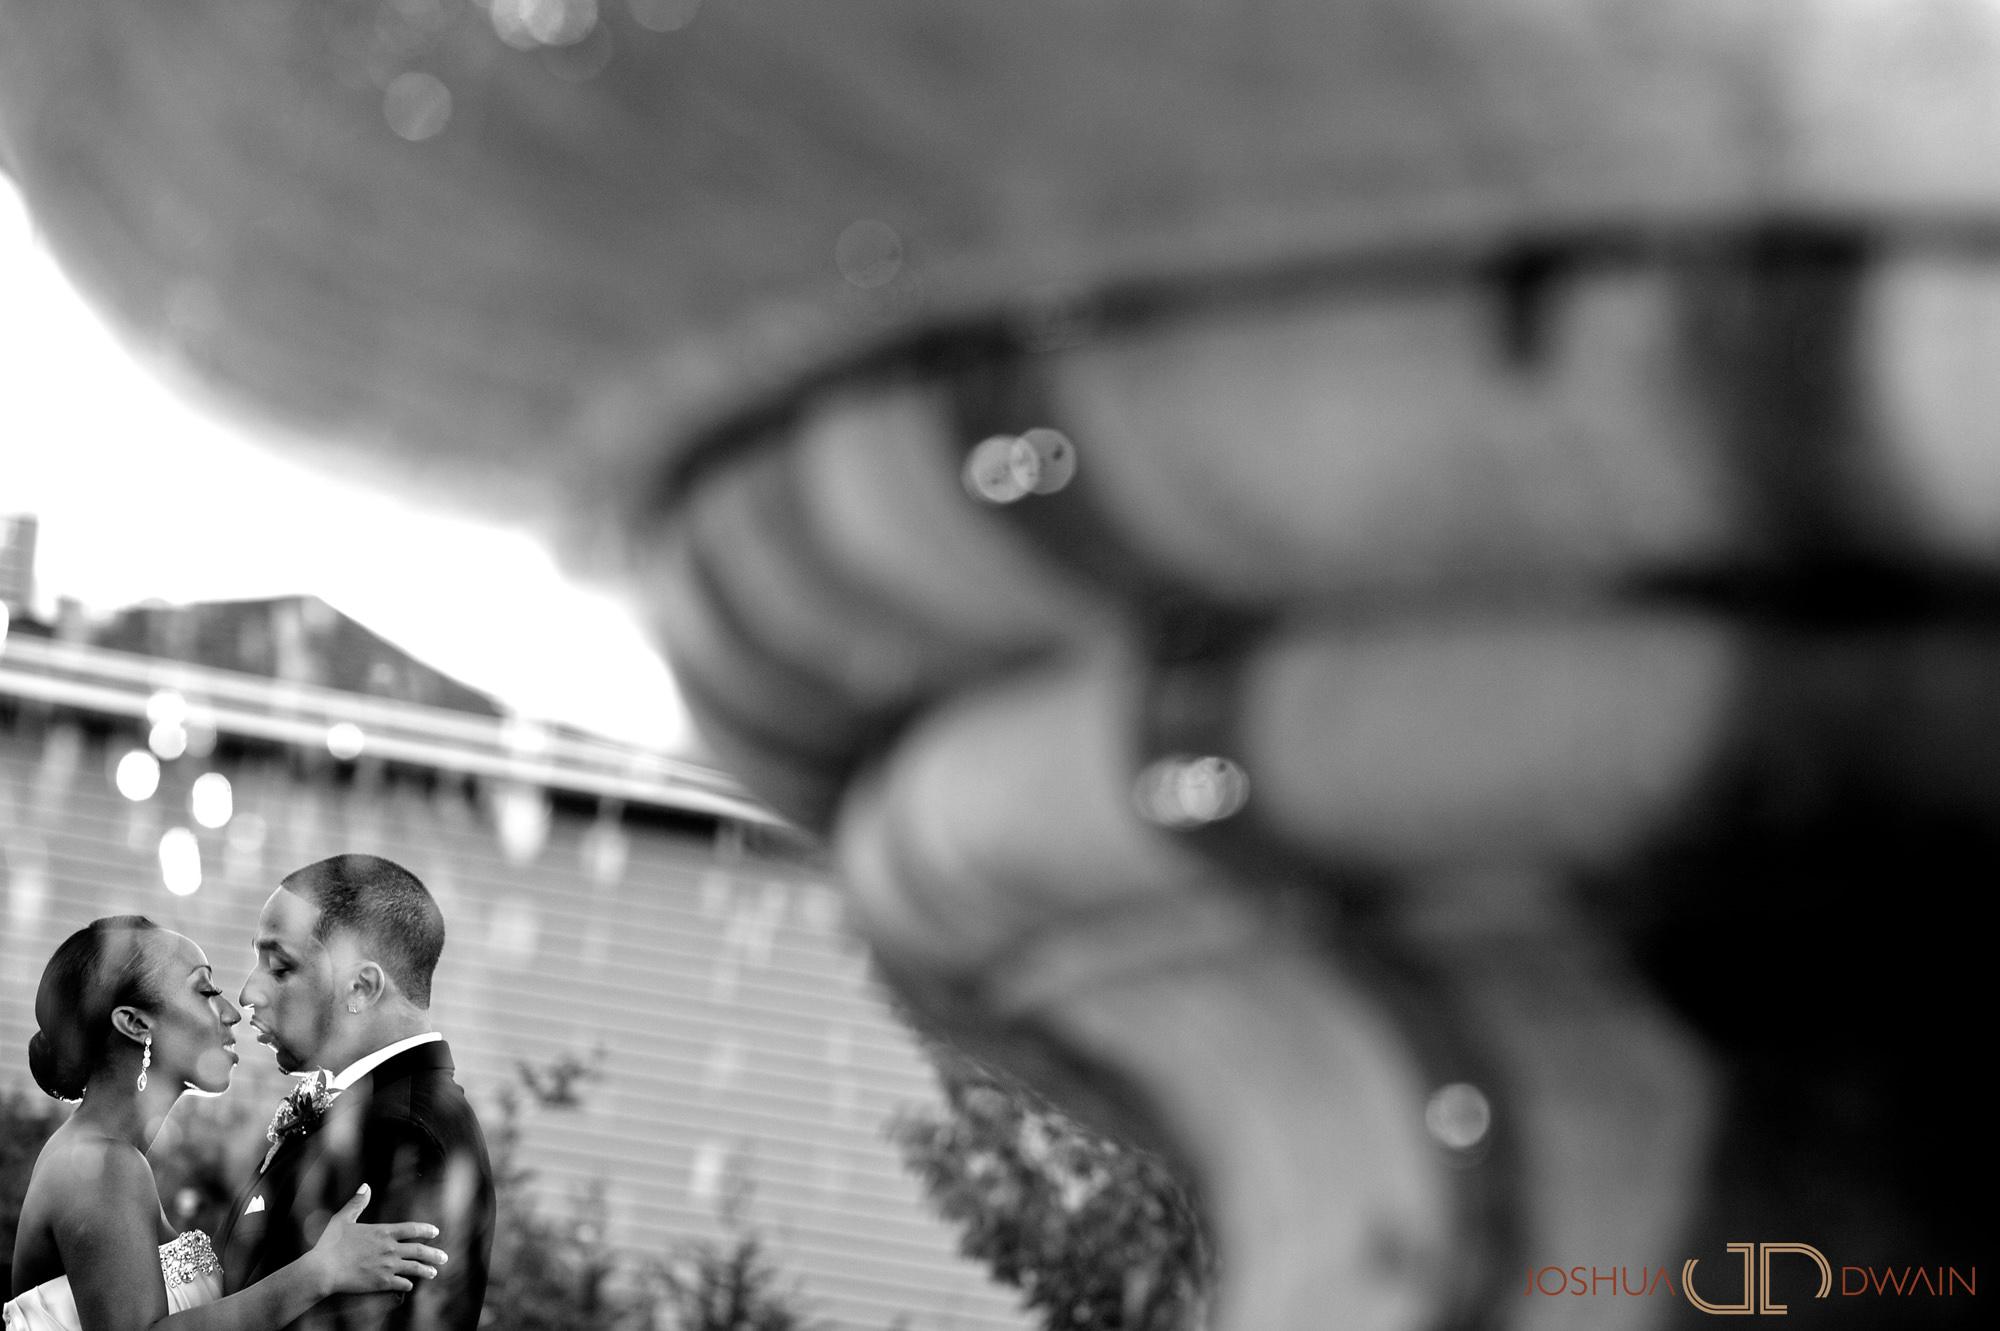 cherisse-stefan-015-russos-on-the-bay-new-york-citywedding-photographer-joshua-dwain-2012-08-24_cs_358